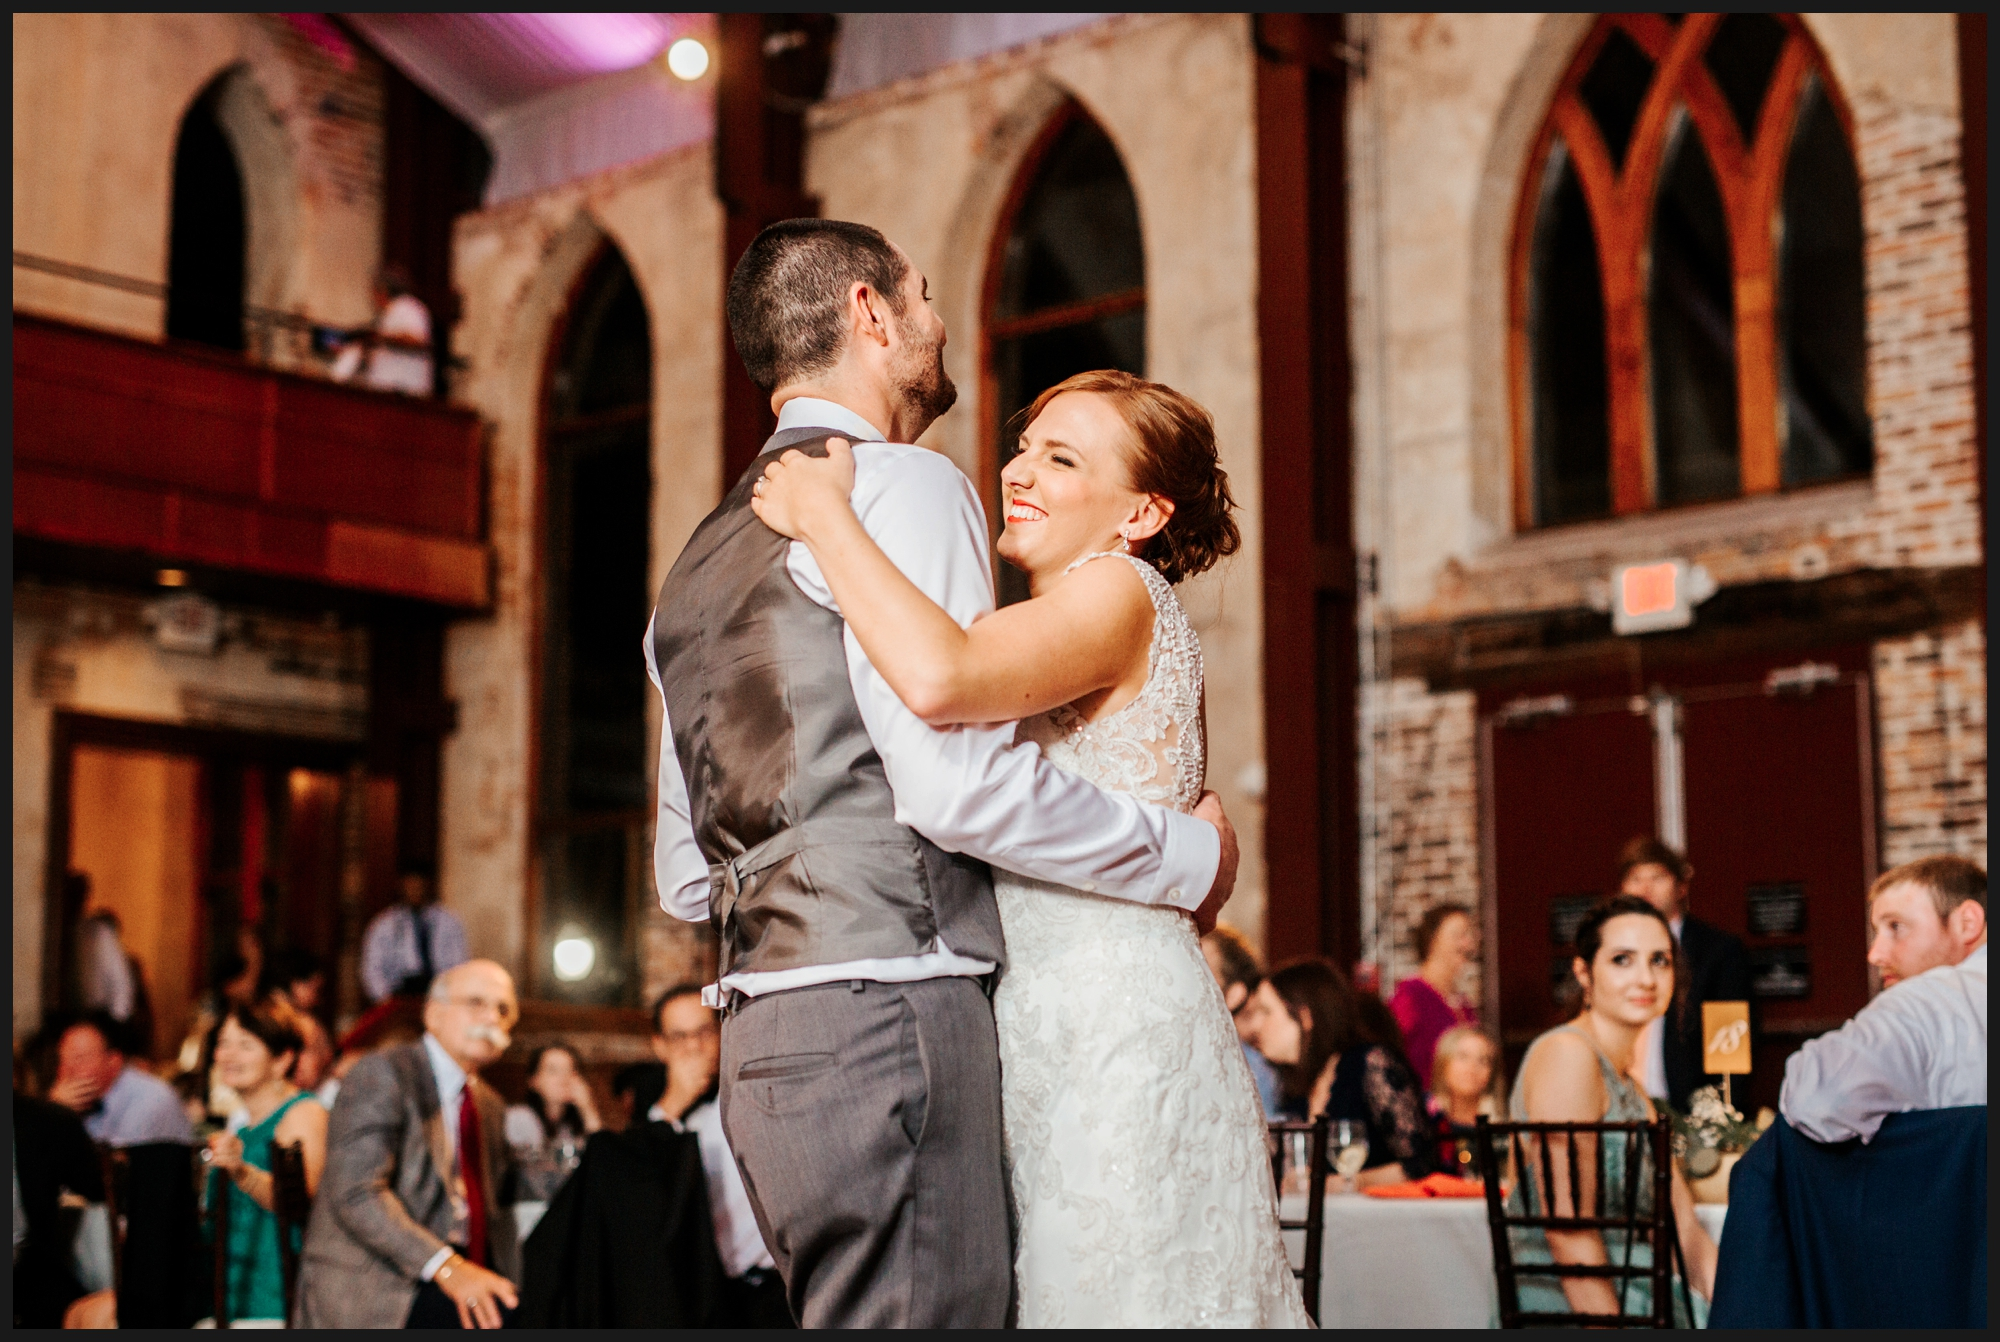 Orlando-Wedding-Photographer-destination-wedding-photographer-florida-wedding-photographer-bohemian-wedding-photographer_0656.jpg